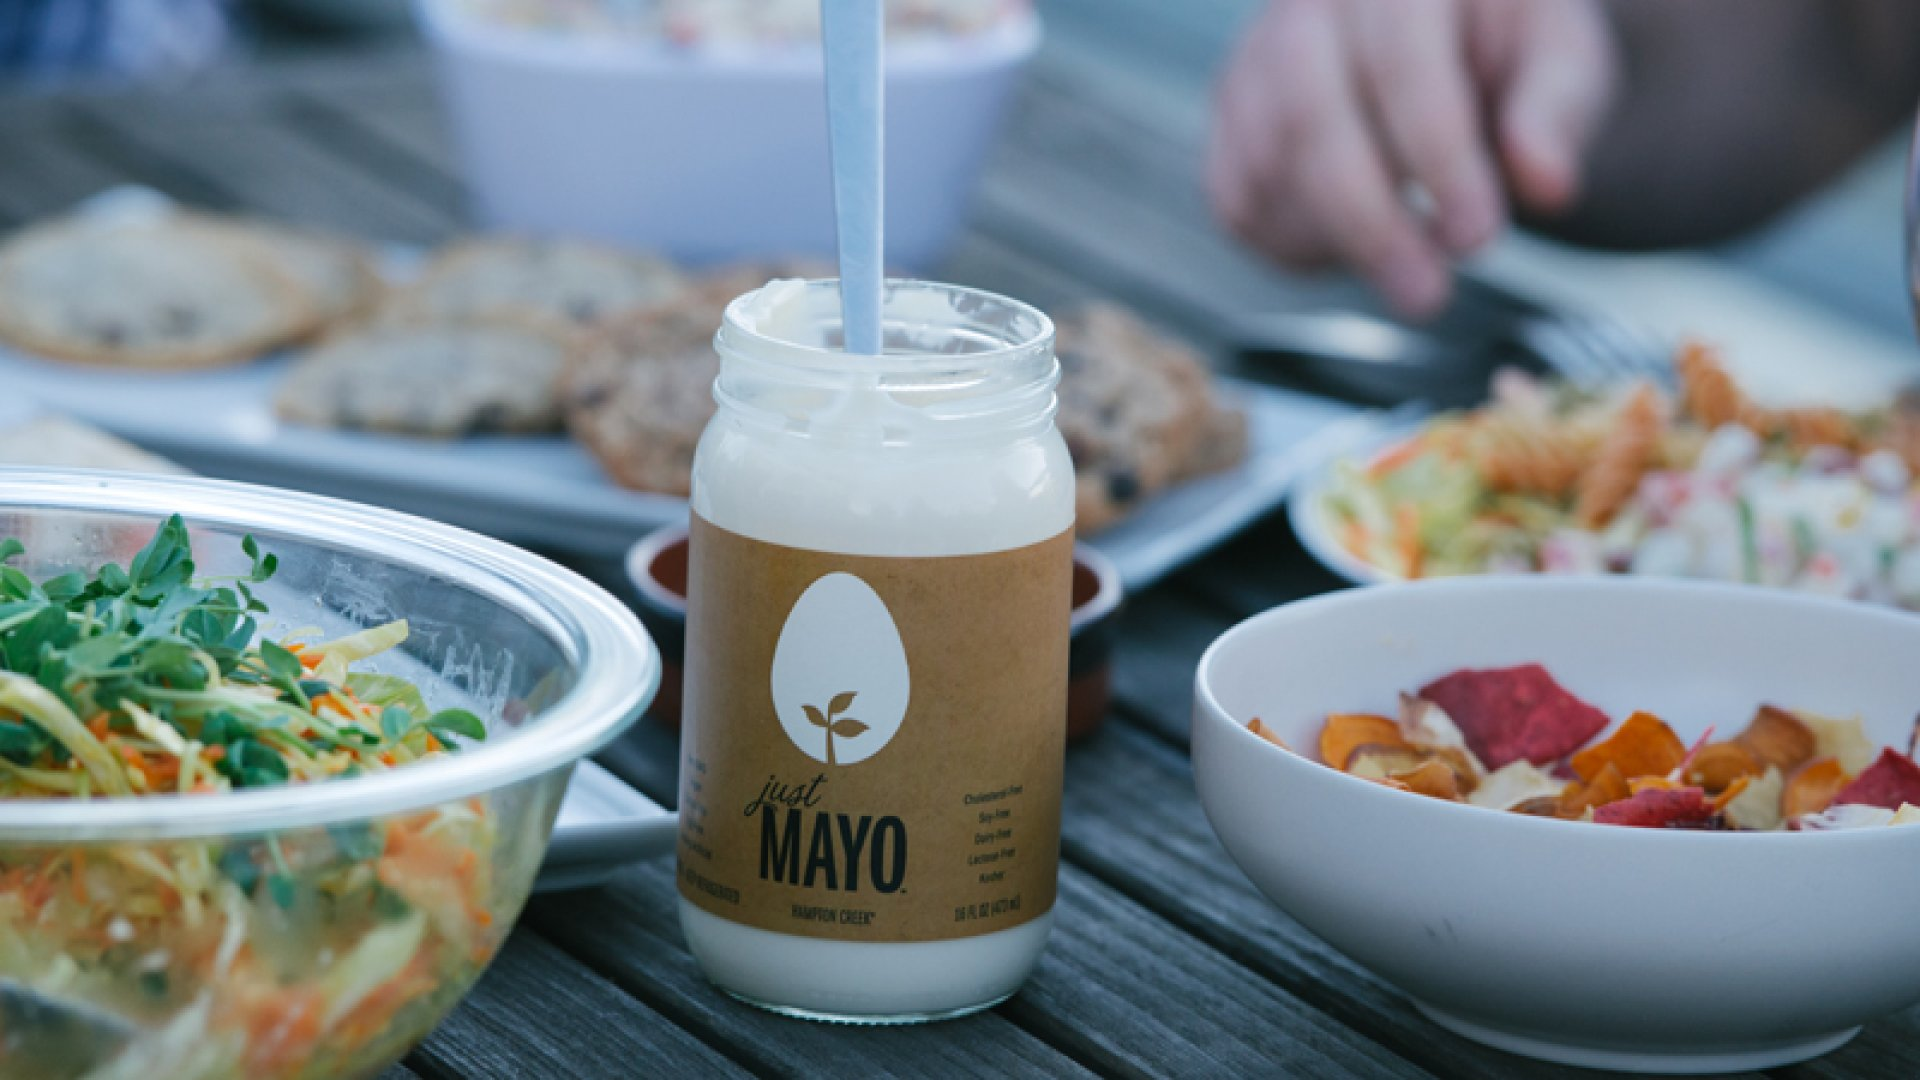 Hampton Creek CEO: No Plans to Change Name of 'Just Mayo' Despite FDA Warning